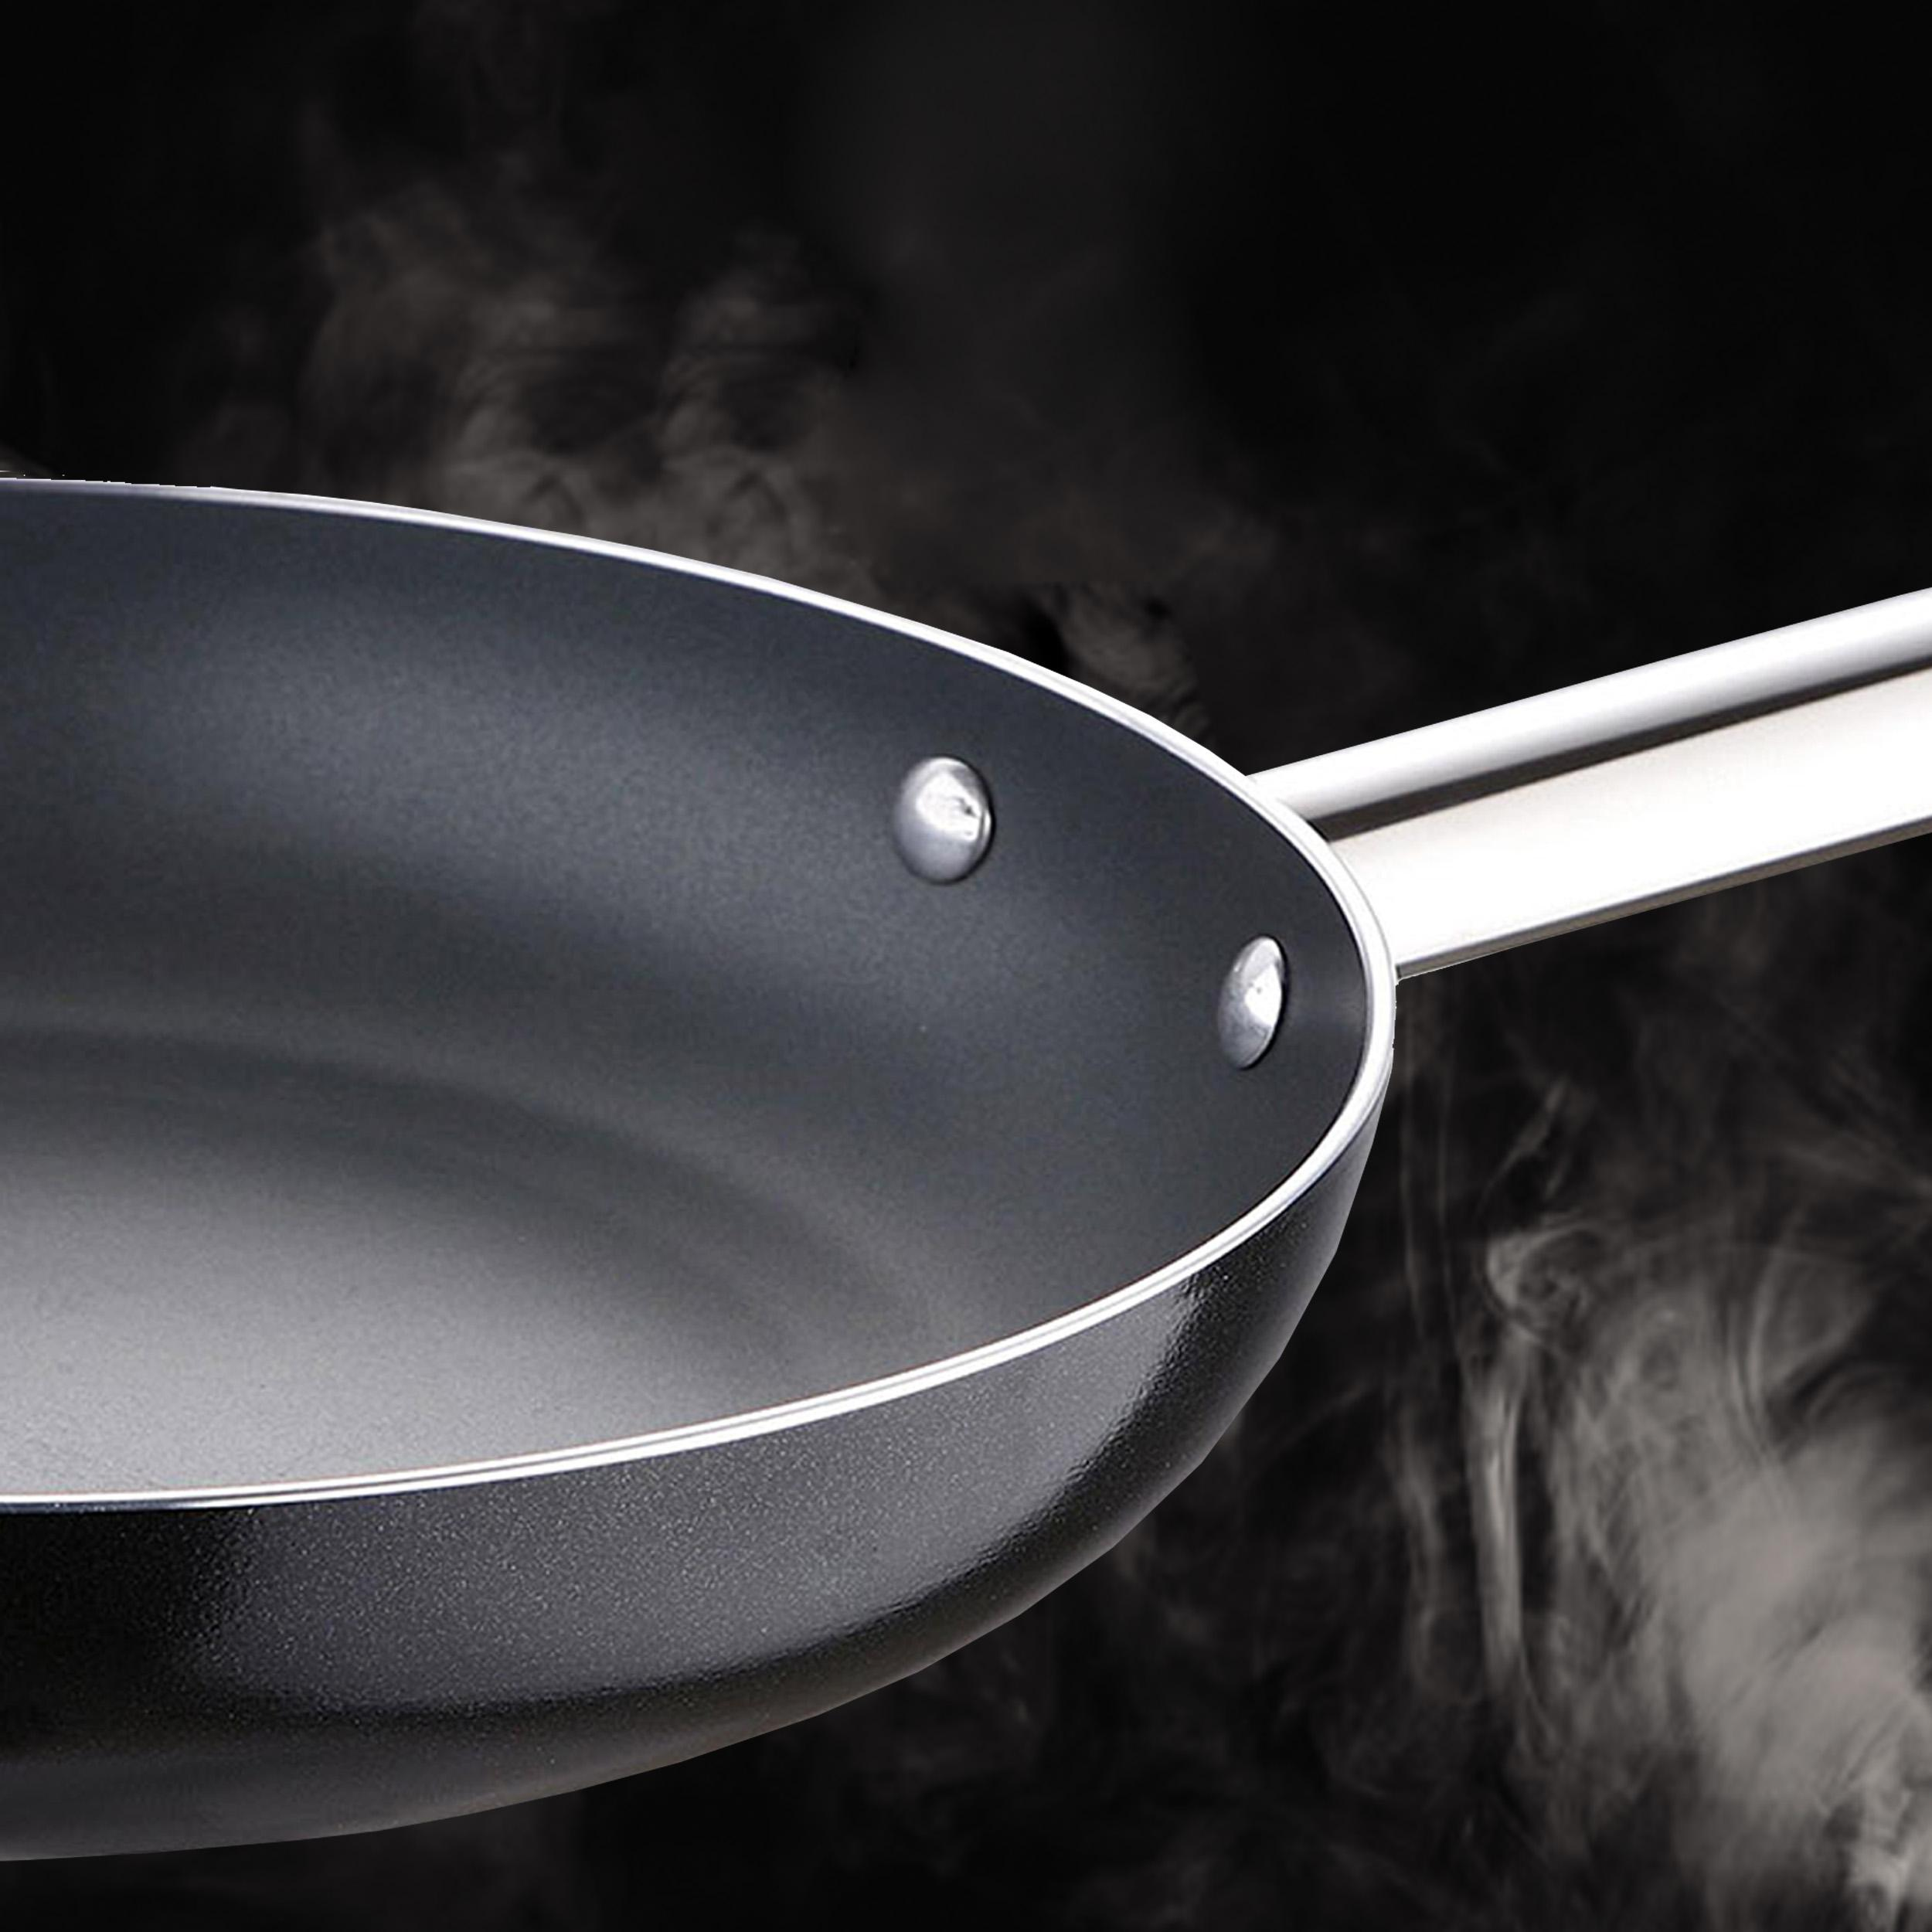 Bergner Masterpro Prochef Sartén, Aluminio, Negro, 26 cm